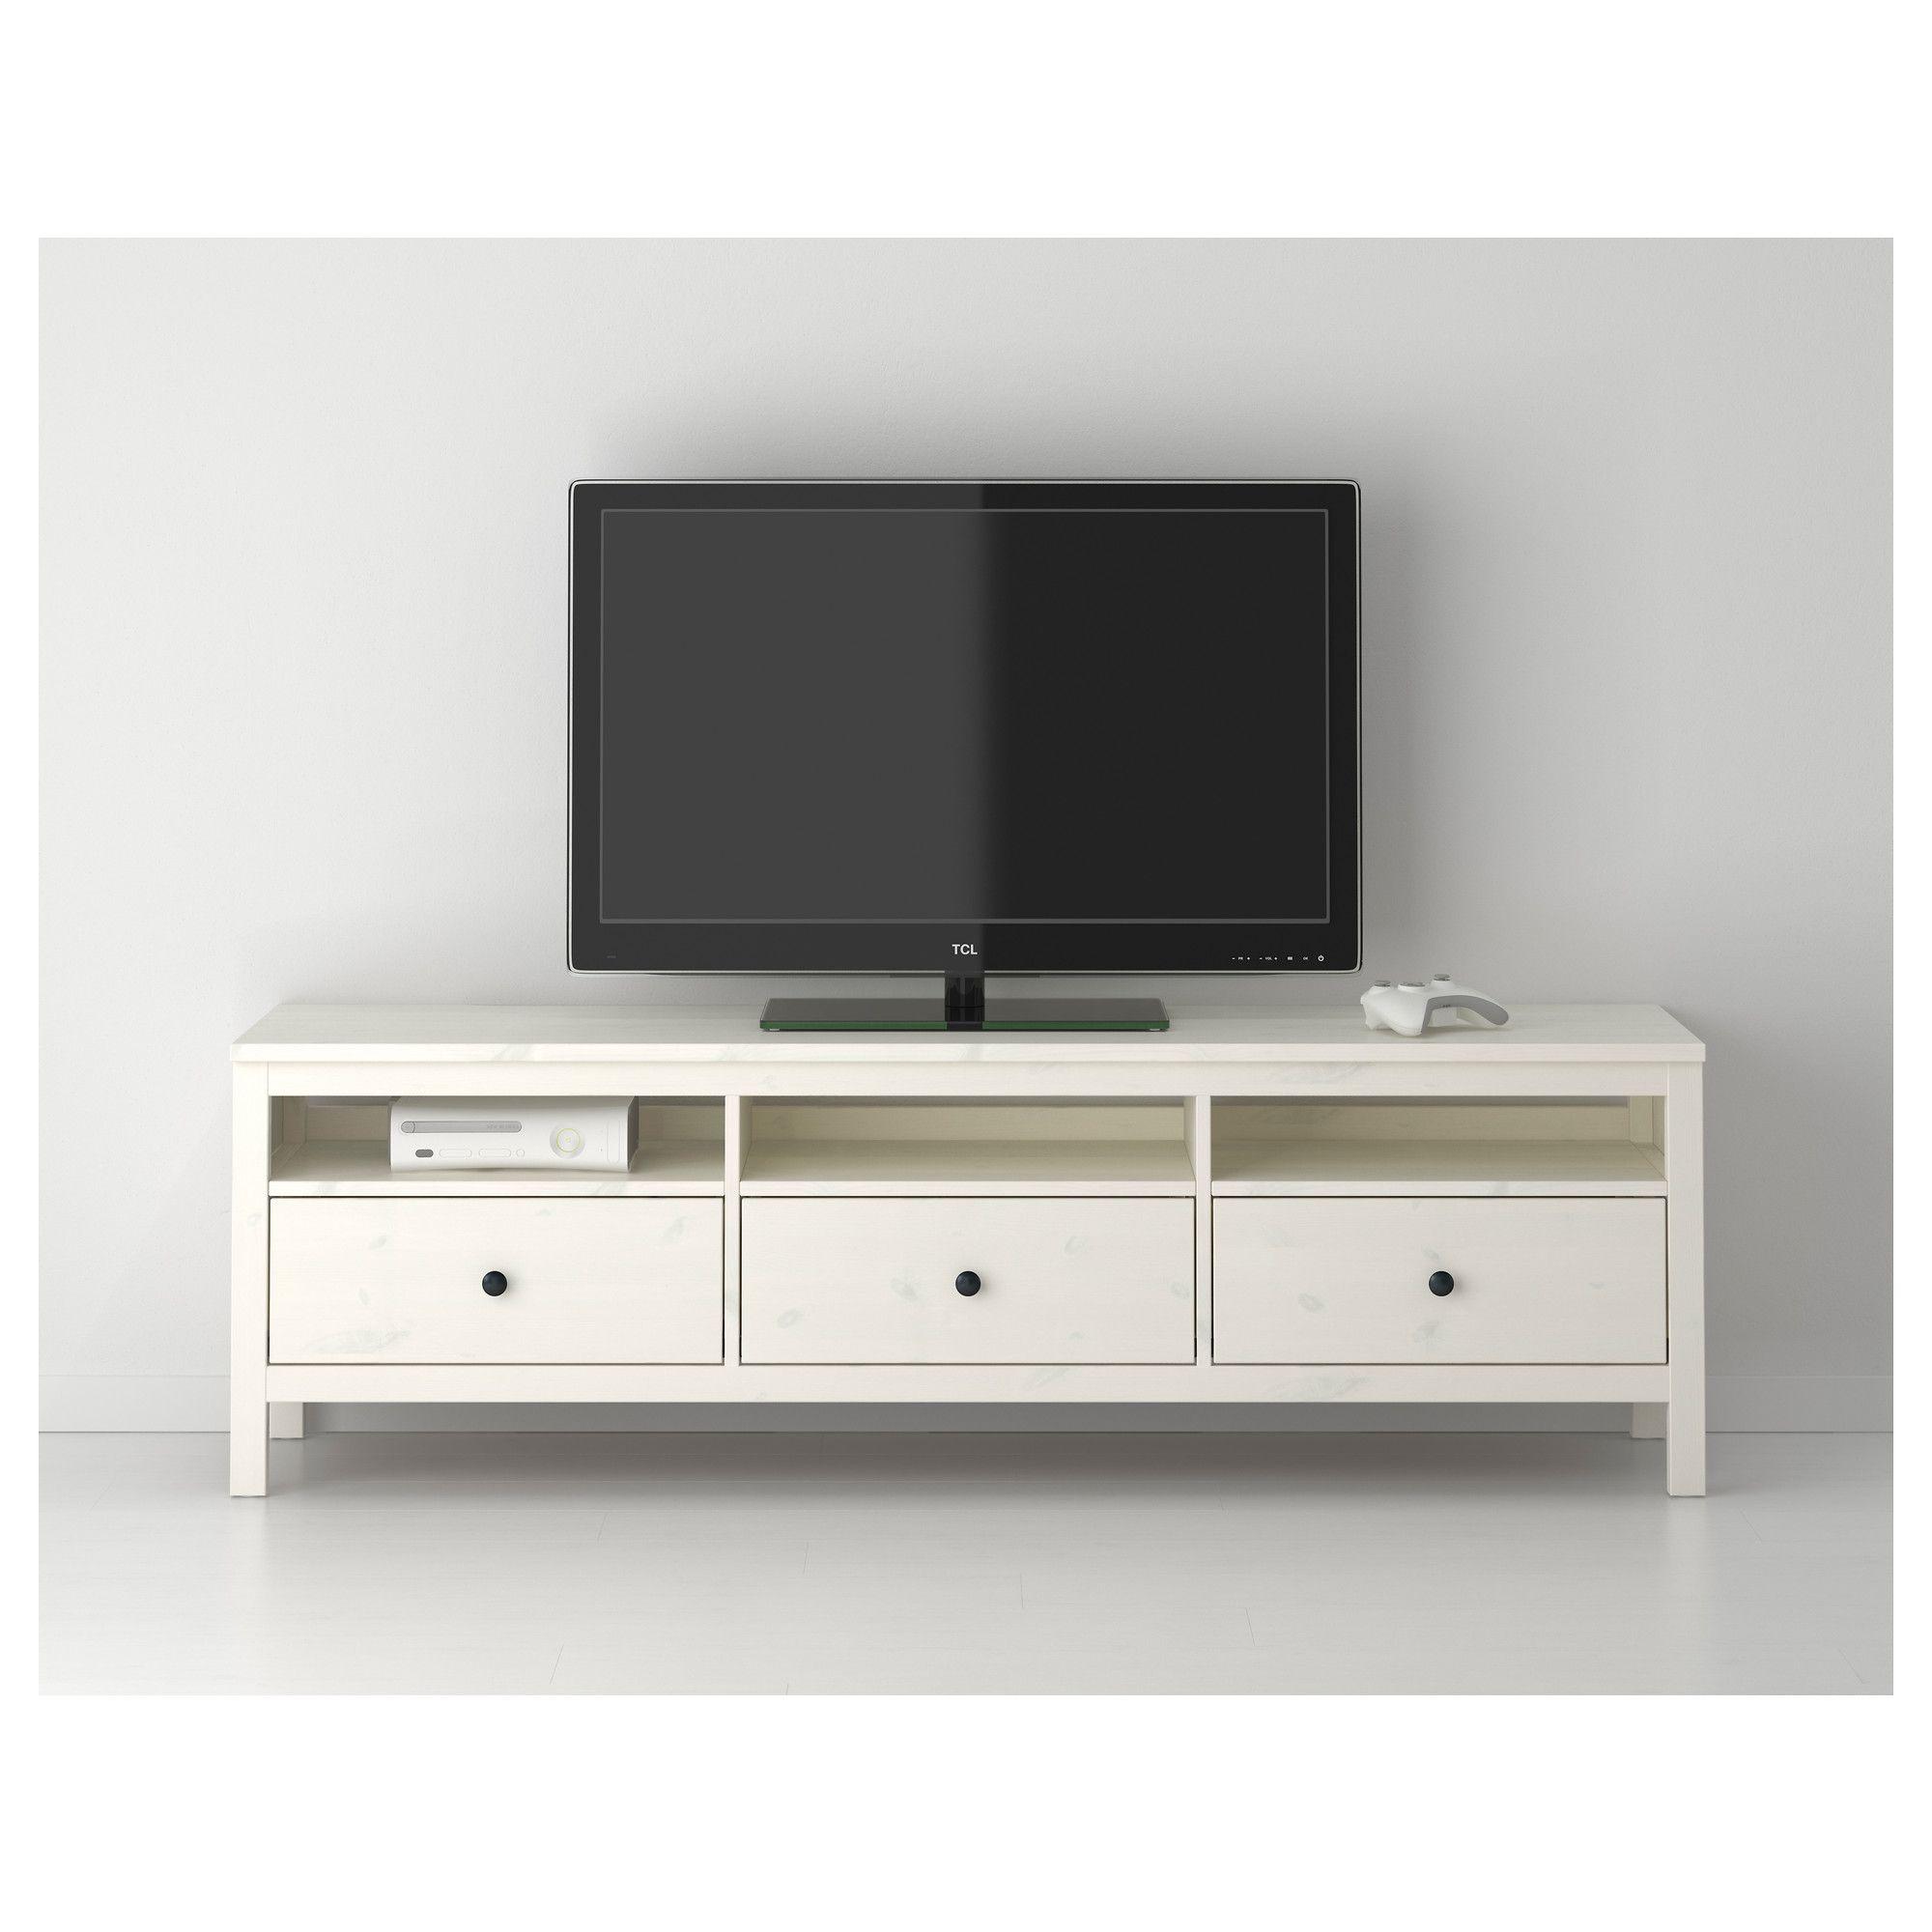 HEMNES TV bench, white stain | HEMNES, Tv bench and White stain